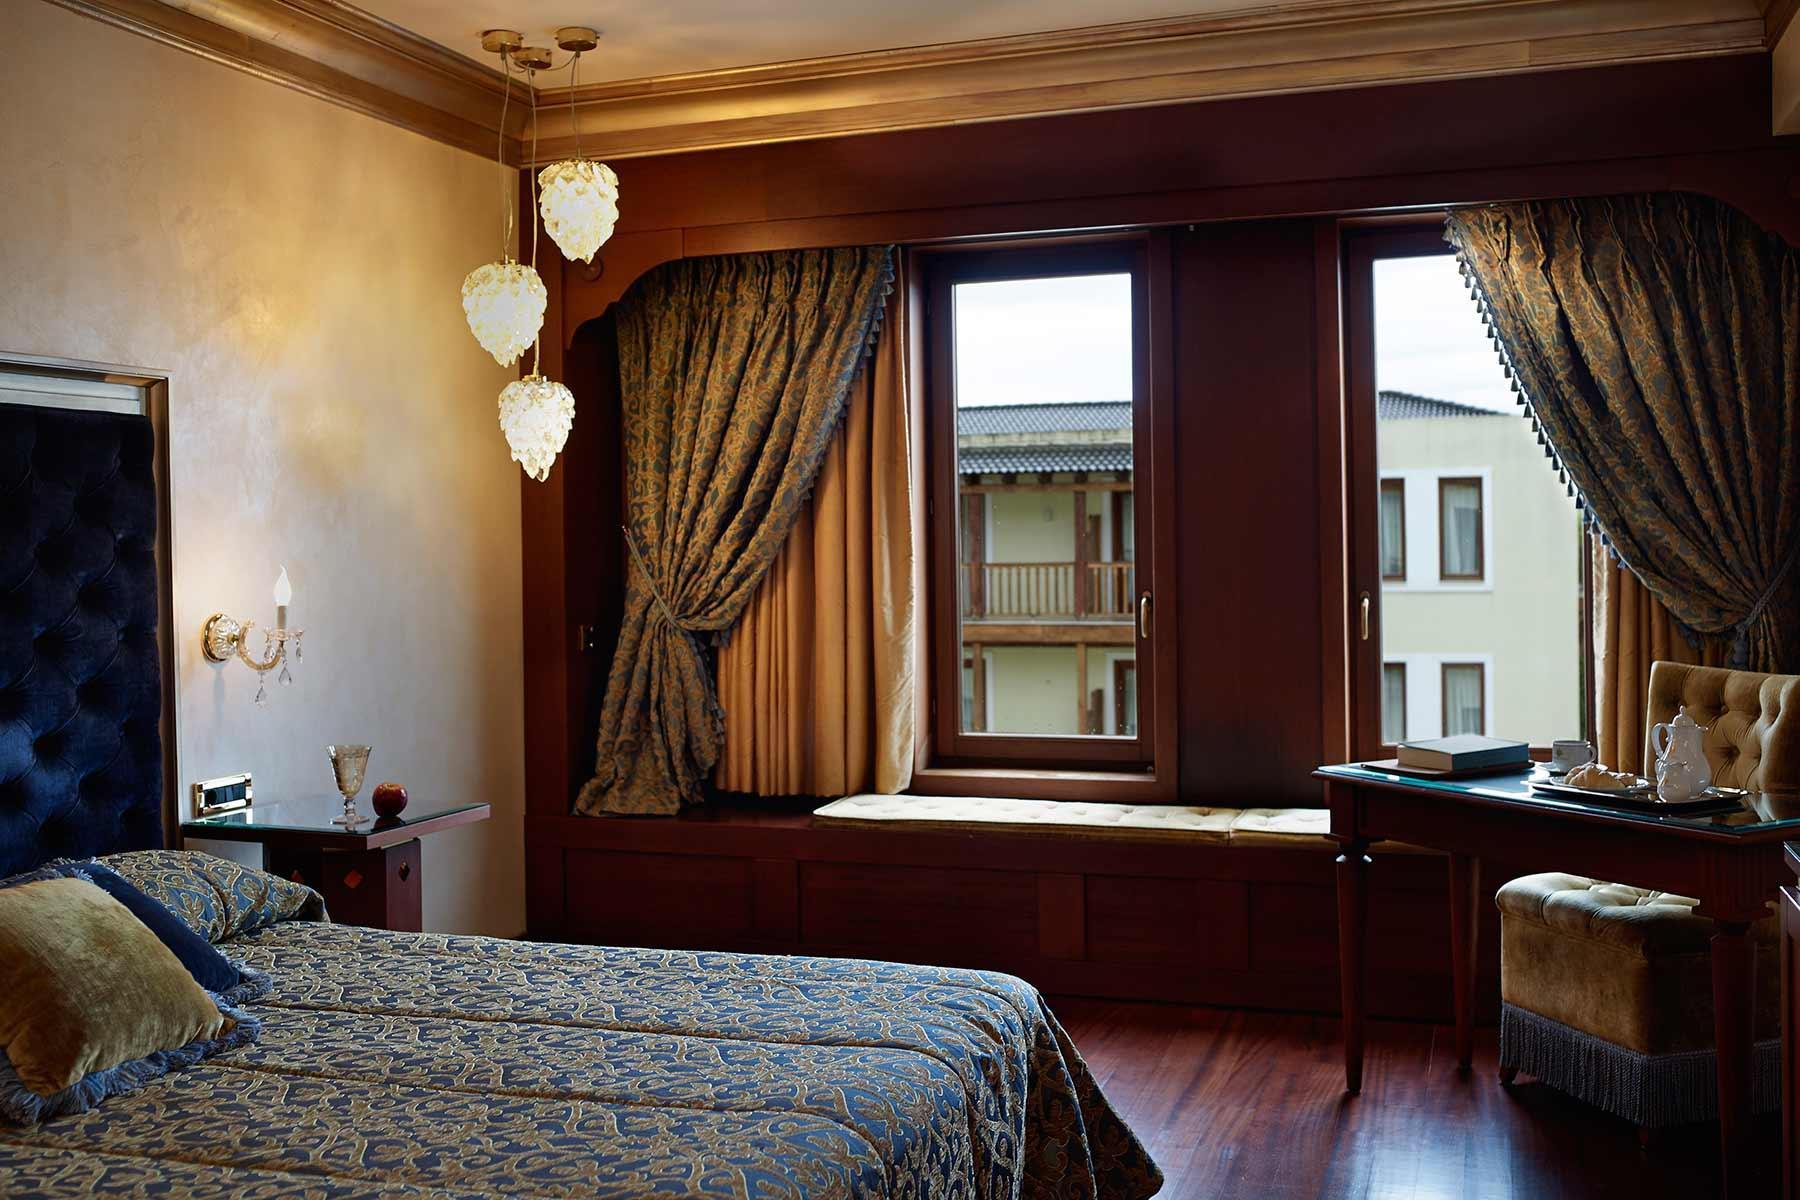 grand-serai-superior-double-room-ioannina-greece-2.jpg